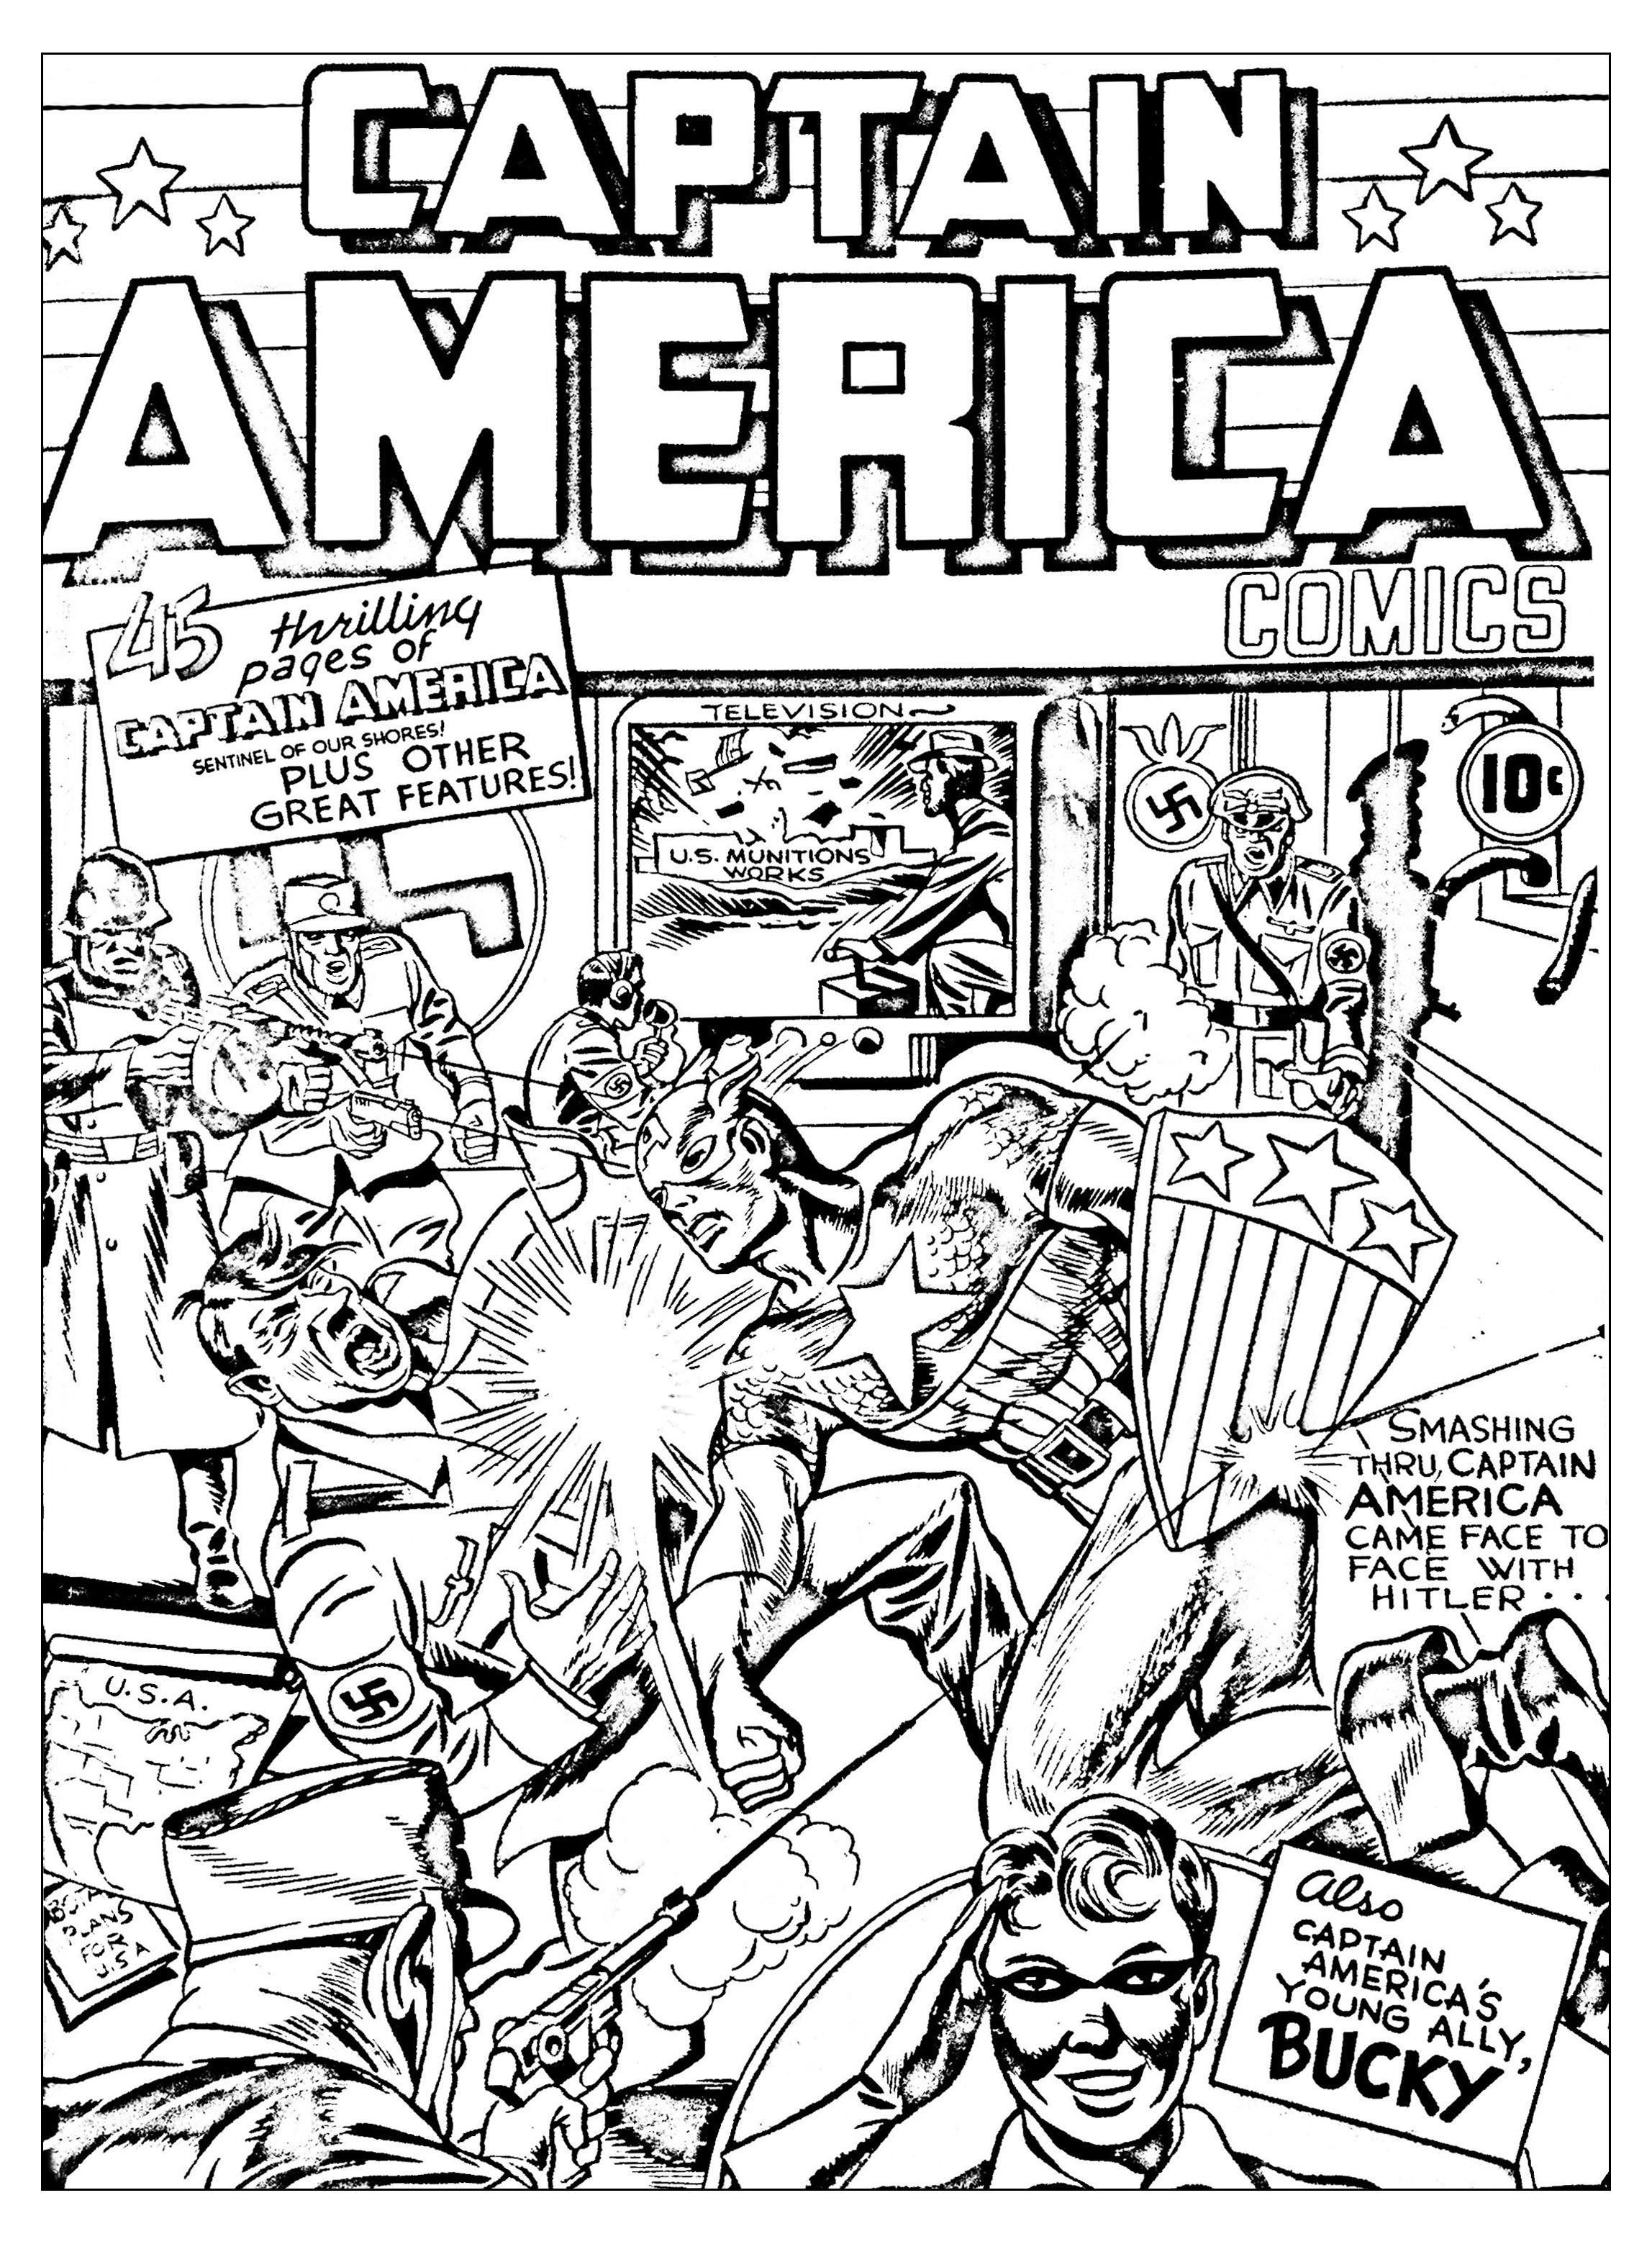 Captain America Vs Hitlerfrom The Gallery Books